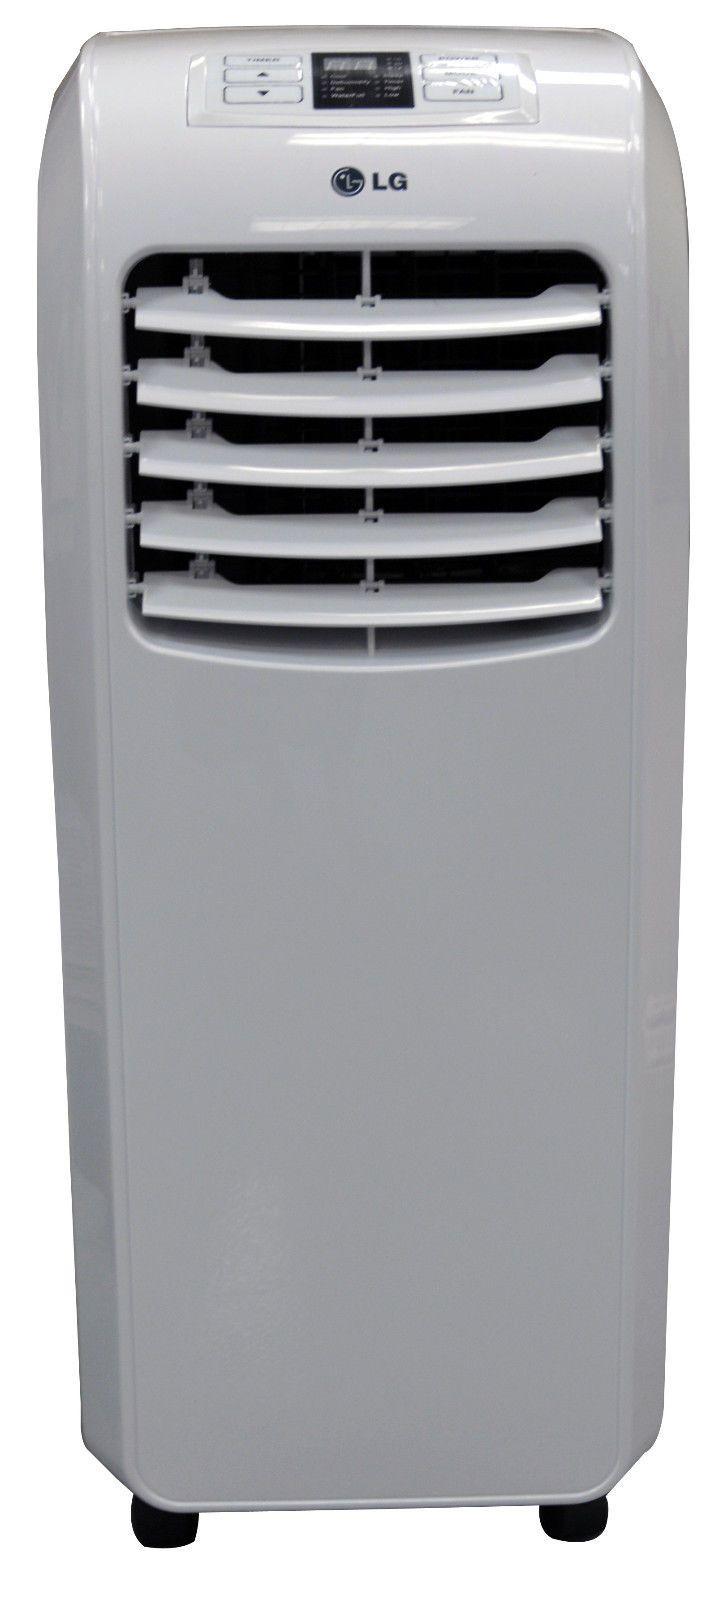 Lg Lp0814wnr 8 000 Btu 110v Portable A C Remote Window Vent Kit Included Portable Air Conditioner Window Portable Air Conditioner Window Air Conditioner